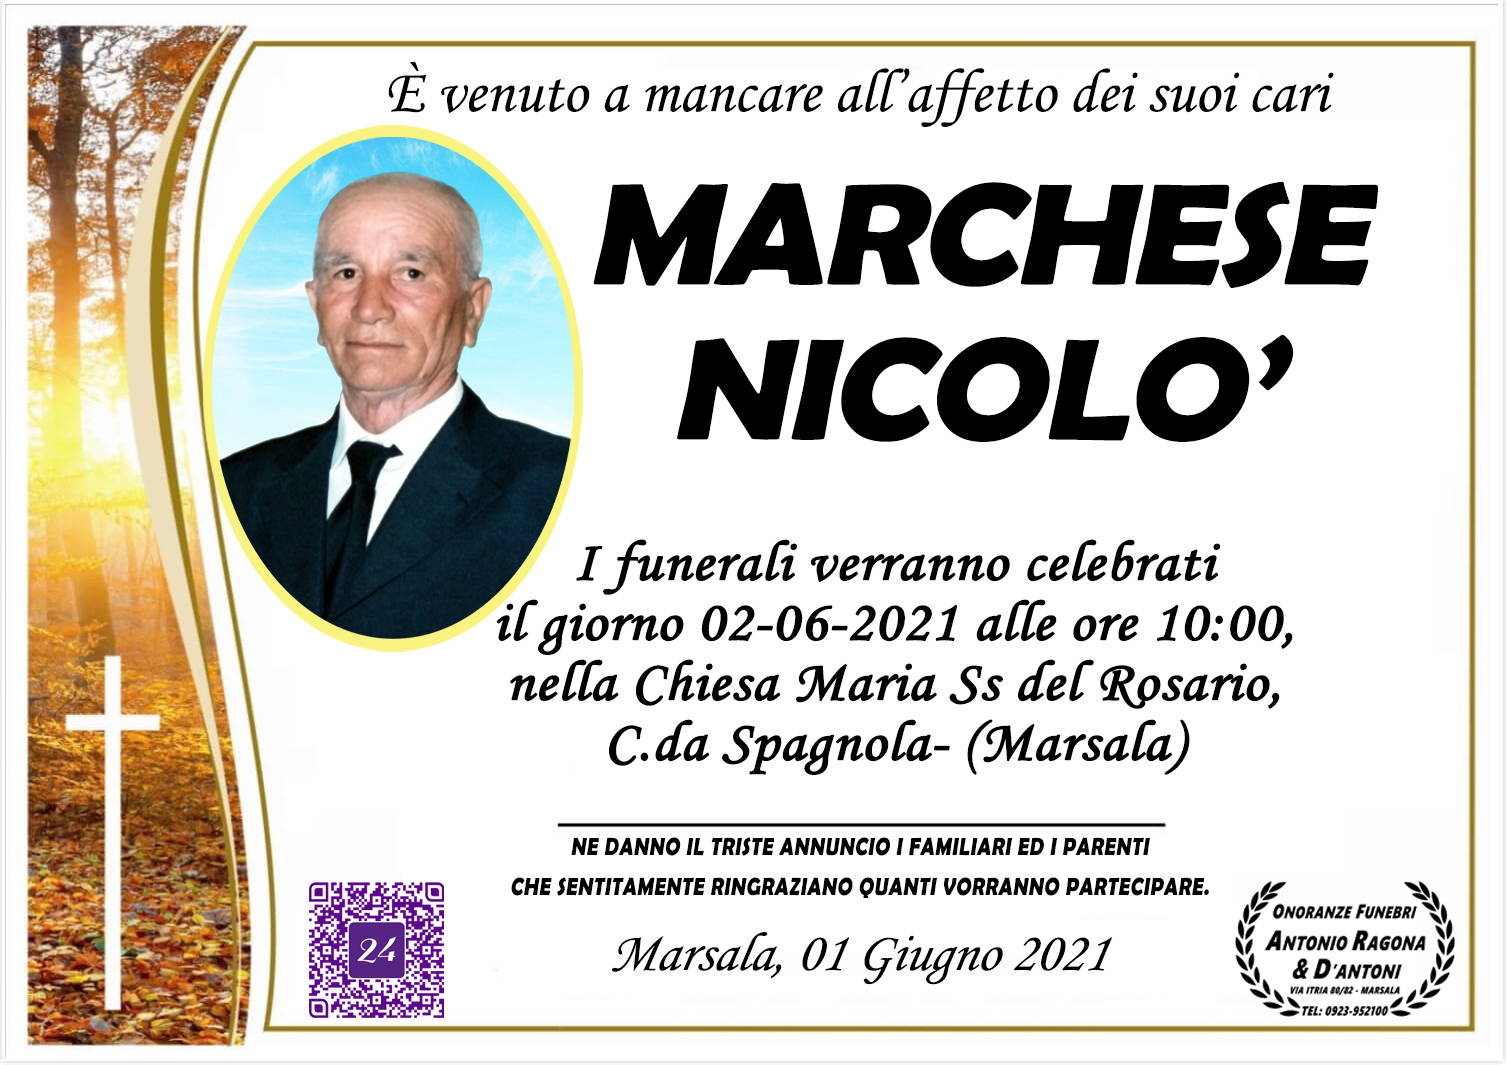 Nicolò Marchese